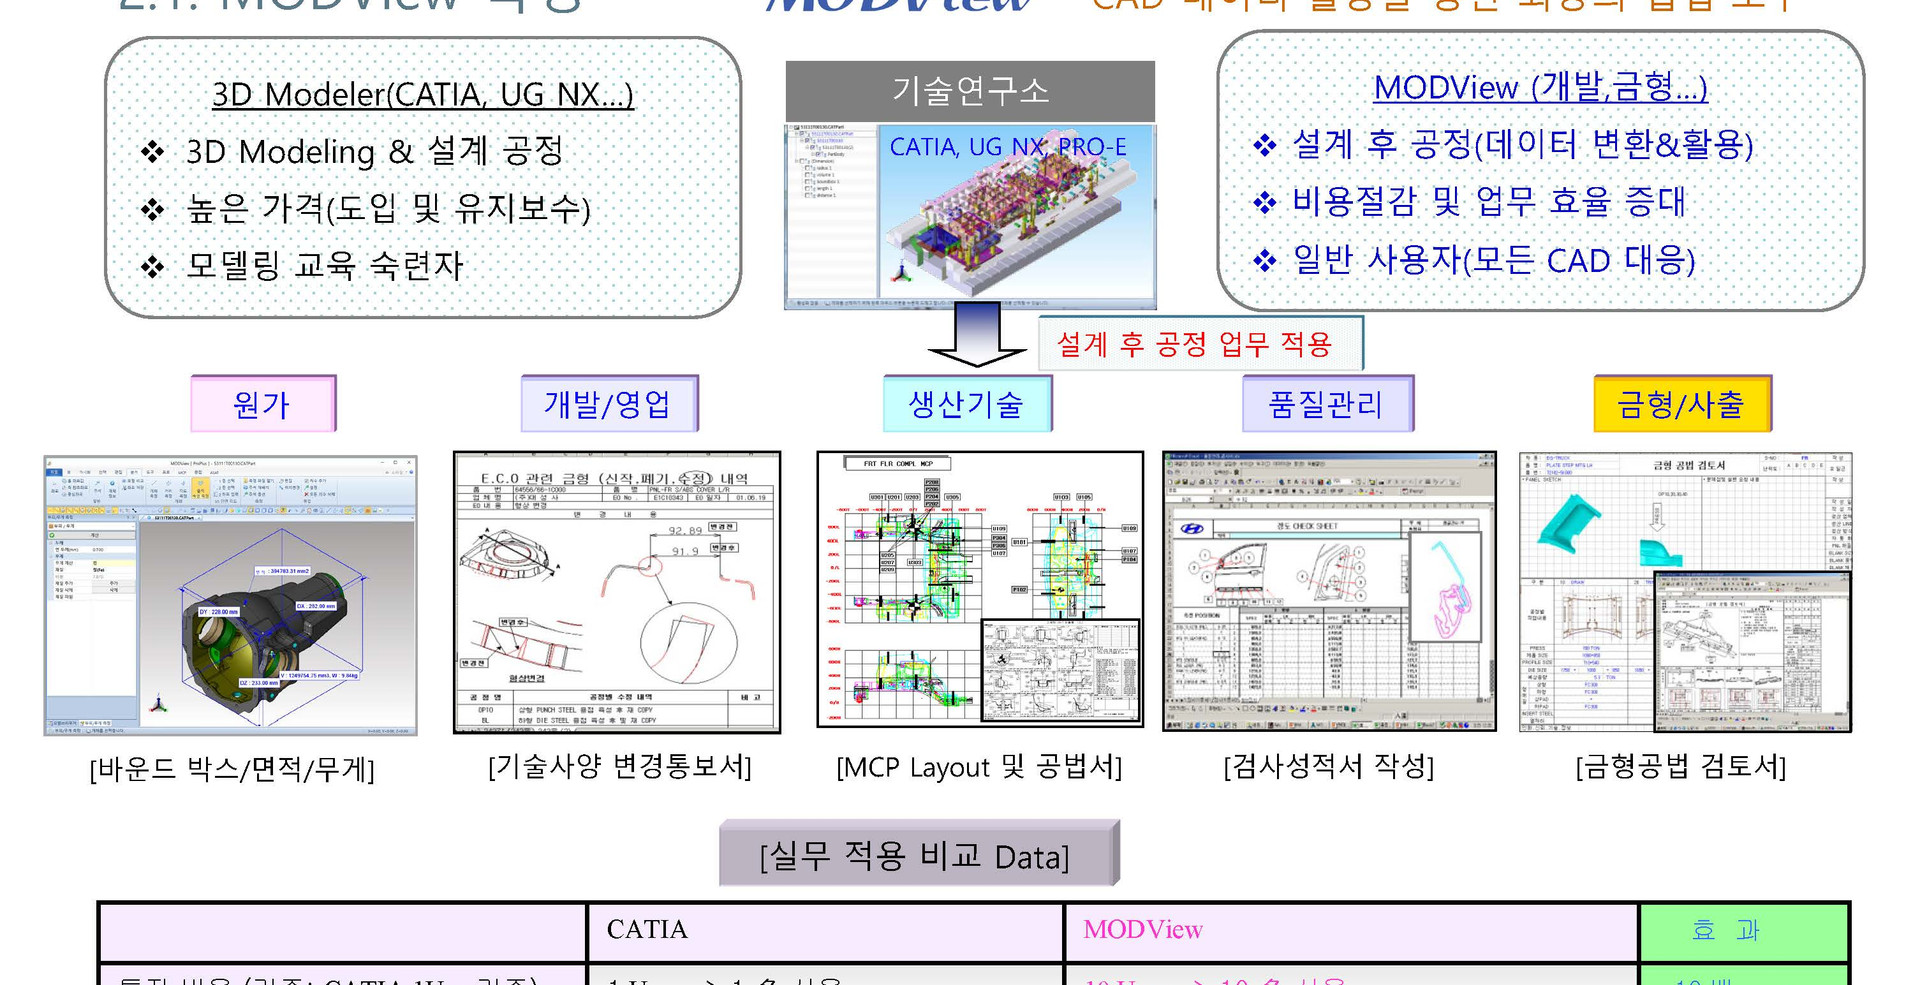 MODView_제안서_Jinyoung_2018_페이지_07.jpg